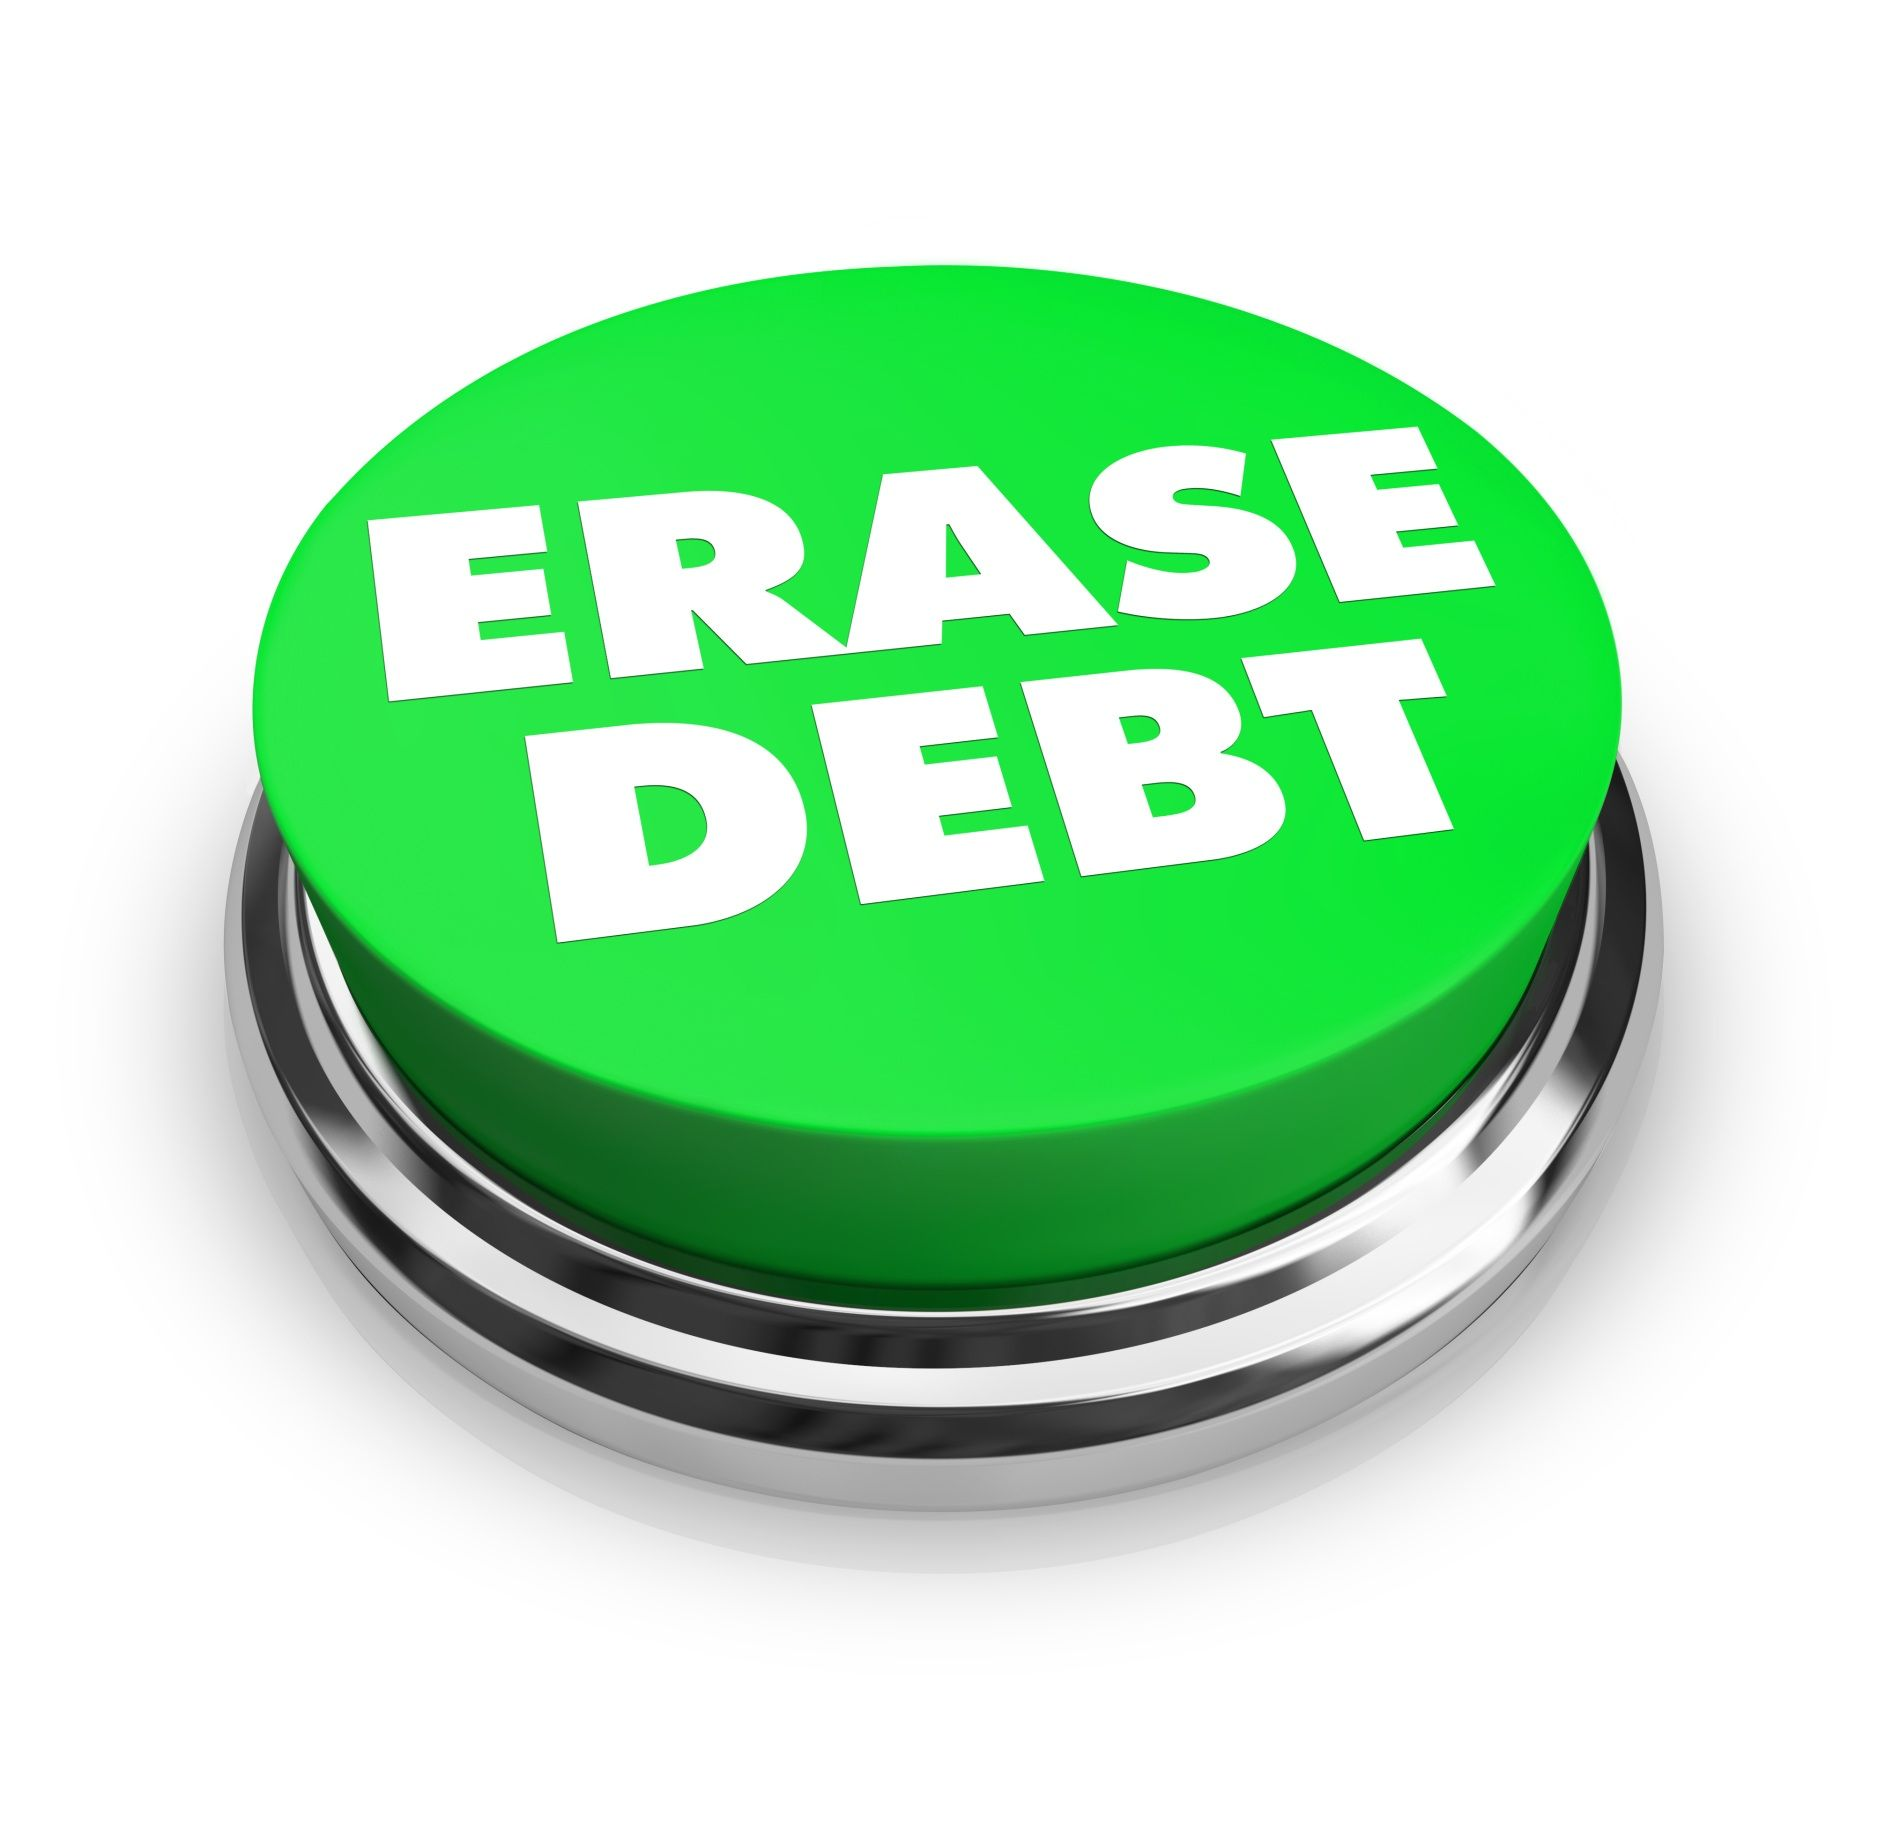 Milwaukeebankruptcyattorney canada bankruptcy saving